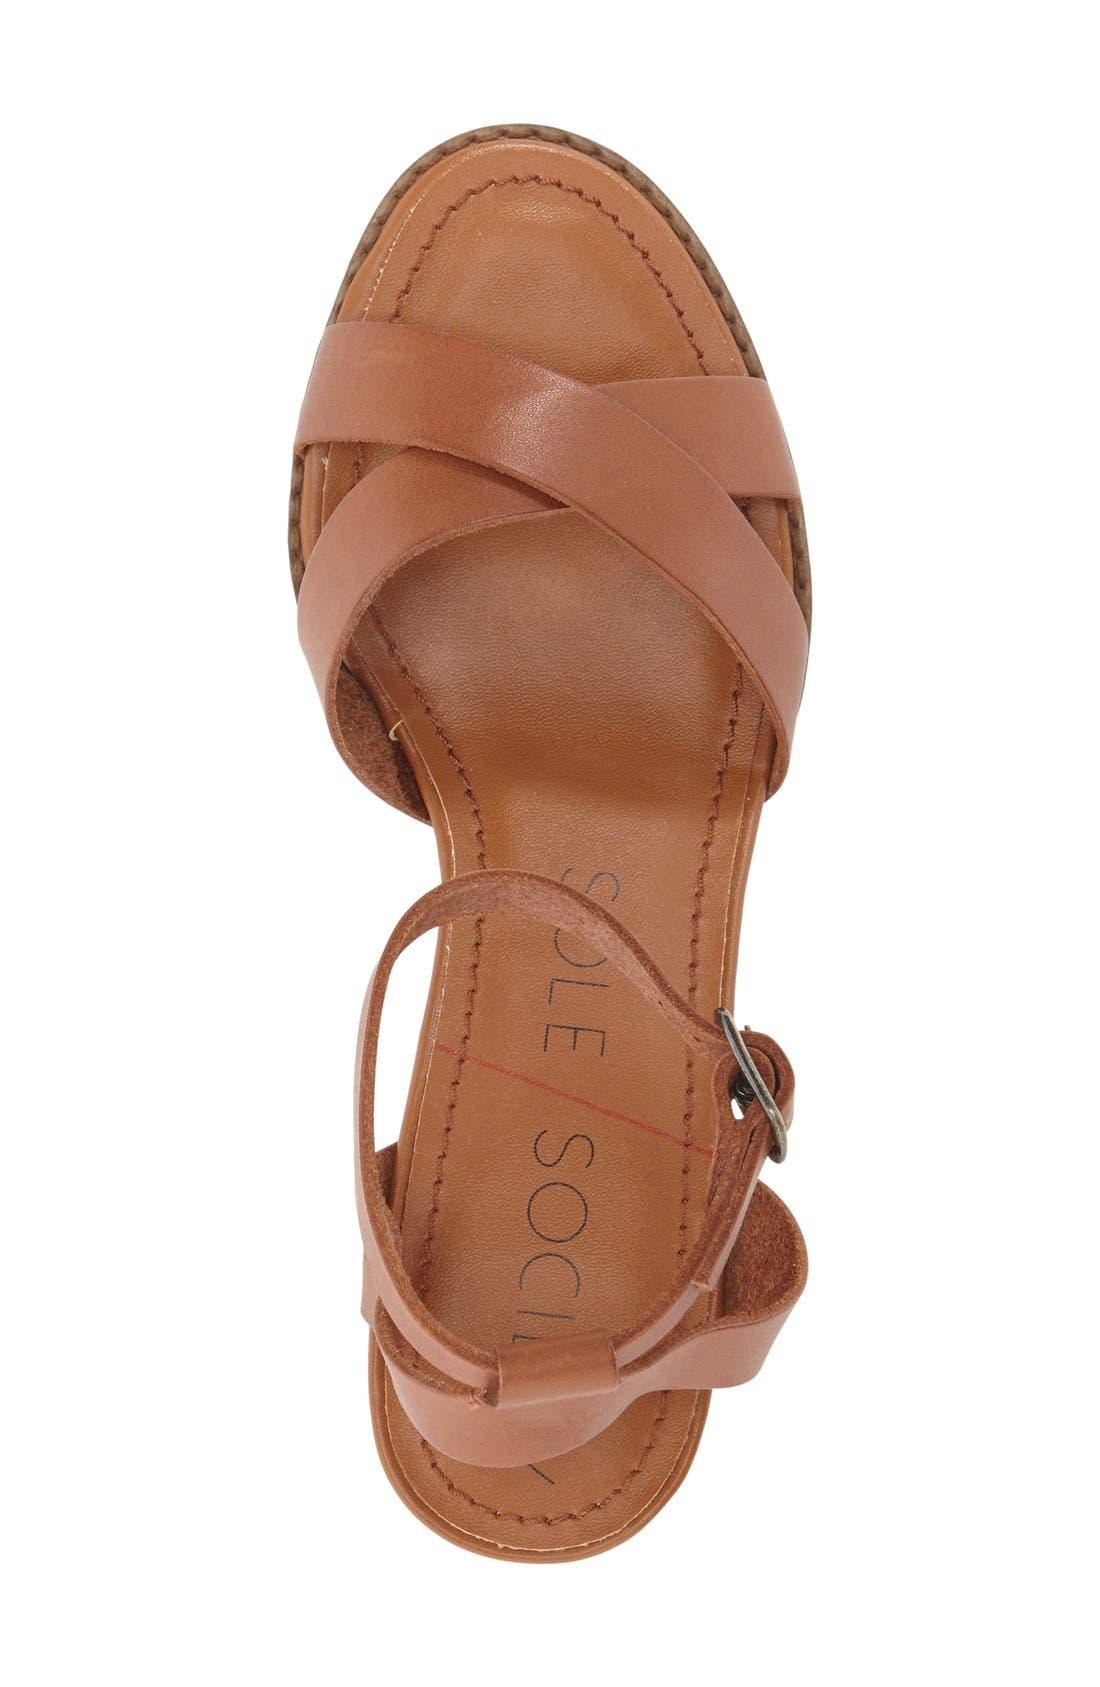 Alternate Image 3  - Sole Society 'Savannah' Sandal (Women)